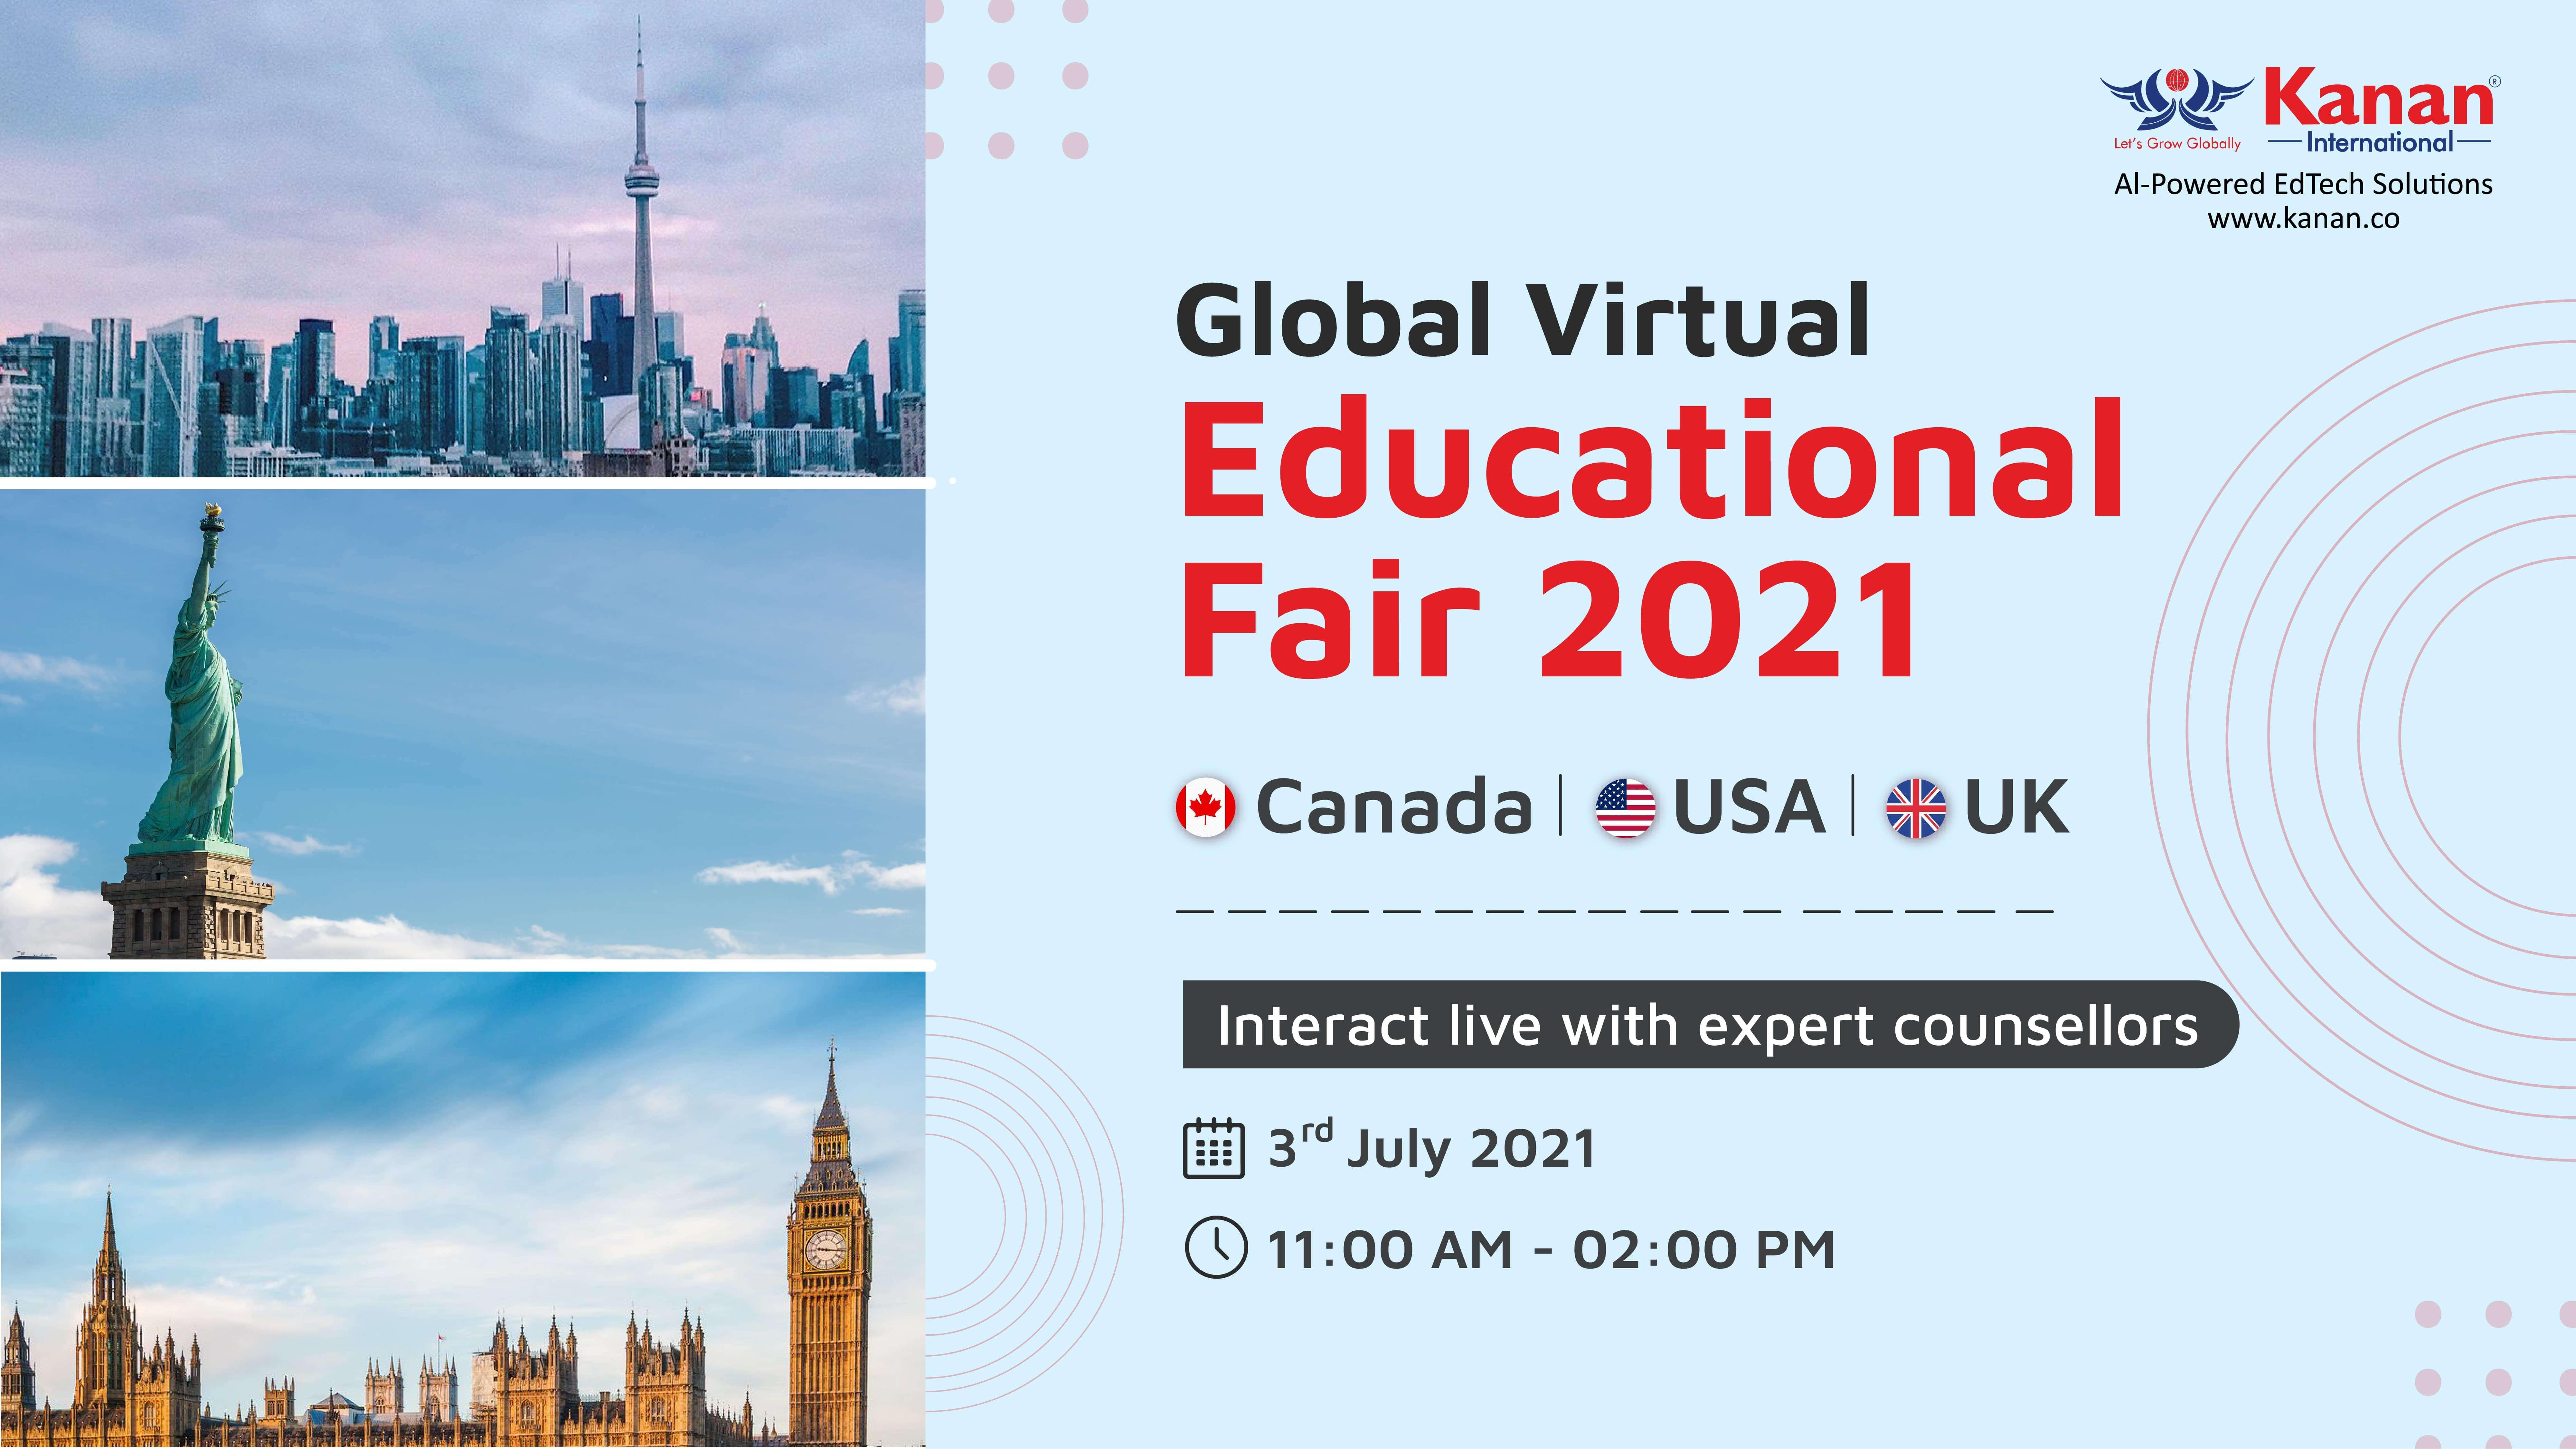 kanan global virtual fair